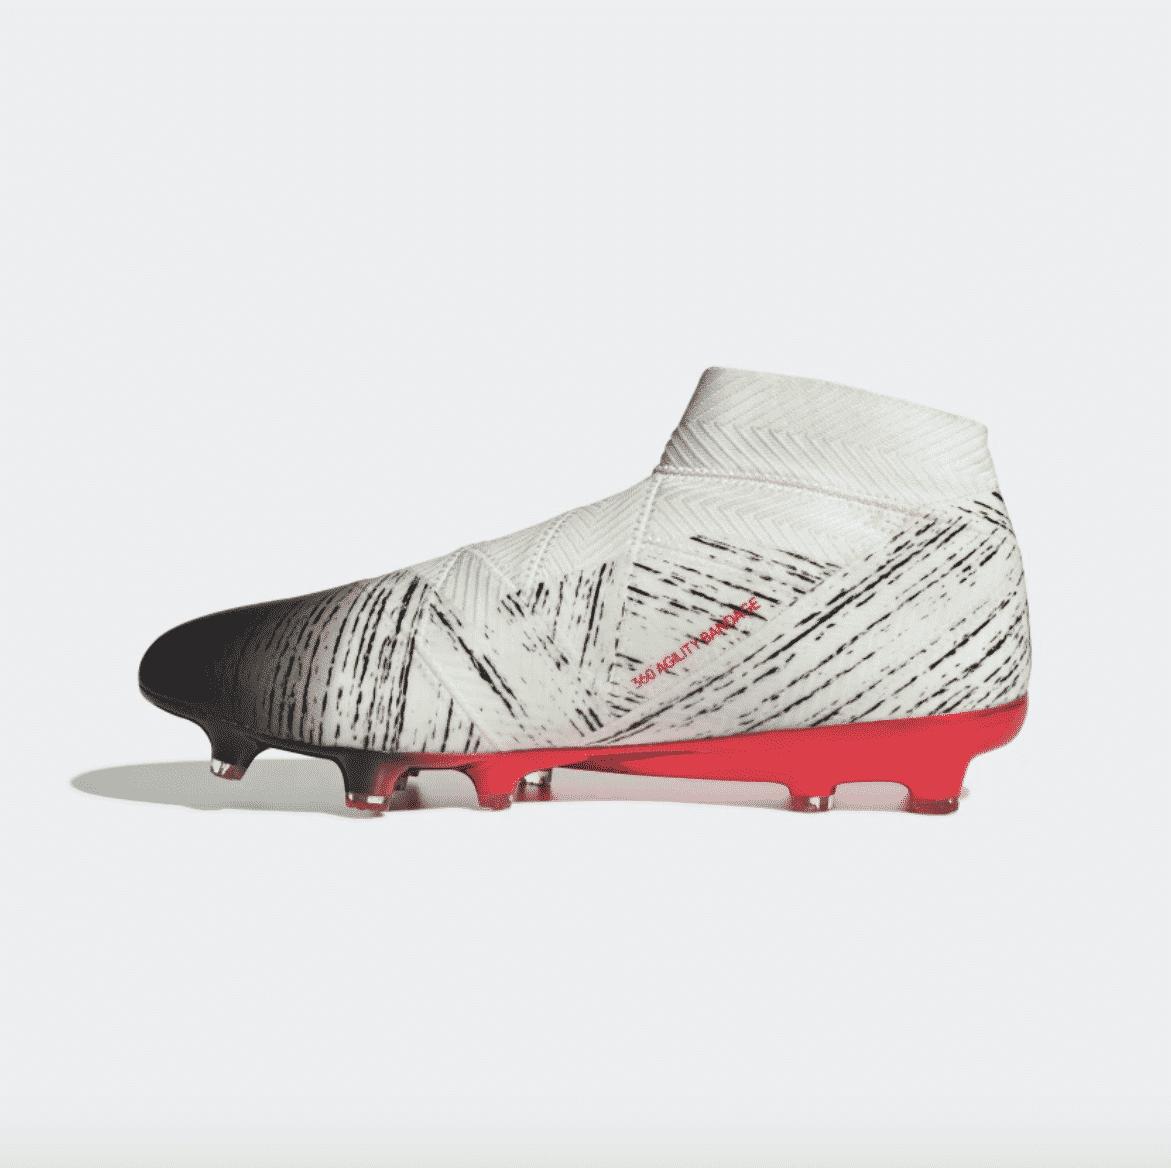 adidas-nemeziz-18+-initiator-pack-3